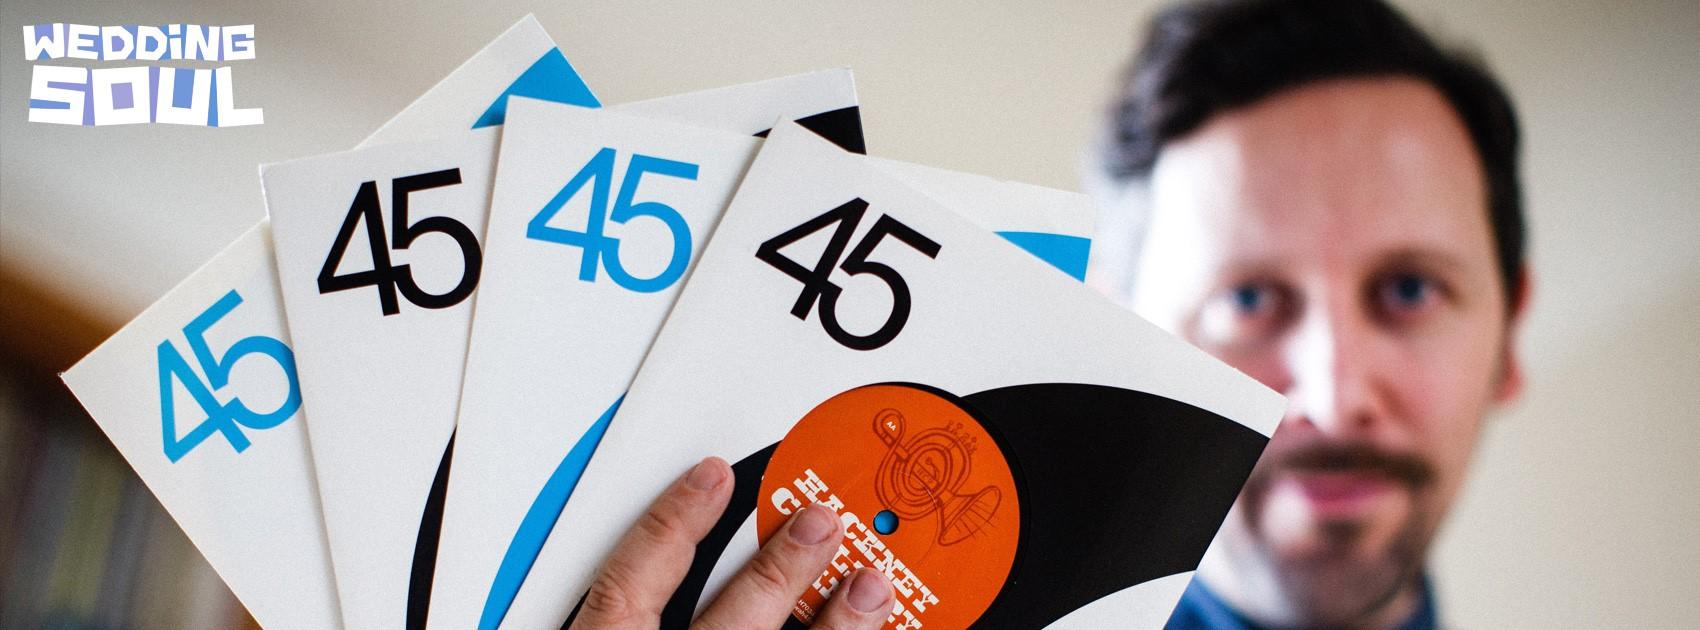 Wedding Soul 63: Wah Wah 45 Special w/ Dom Servini